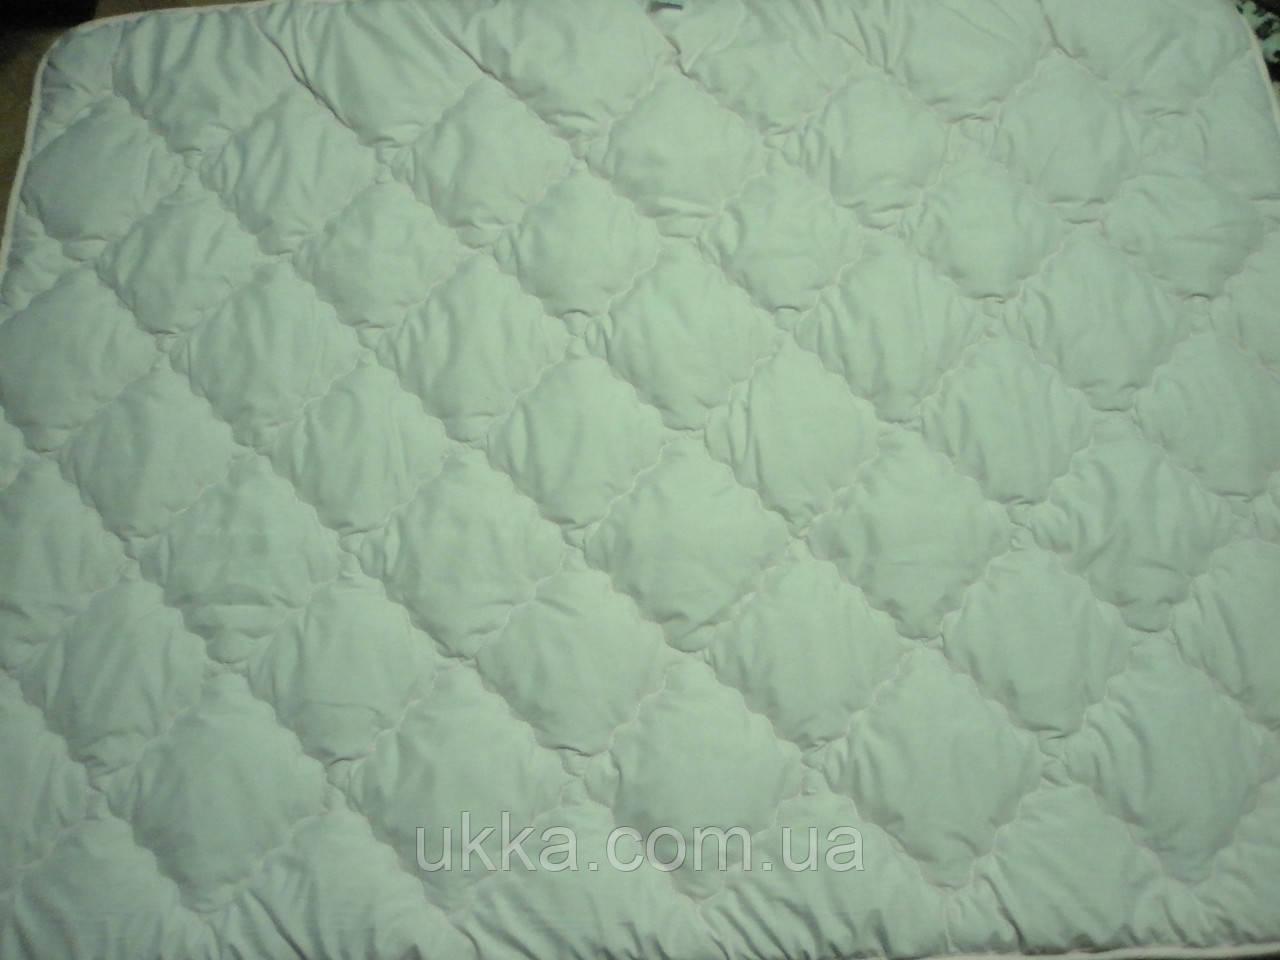 Одеяло в кроватку холлофайбер ткань микрофибра 140х110 ОДА